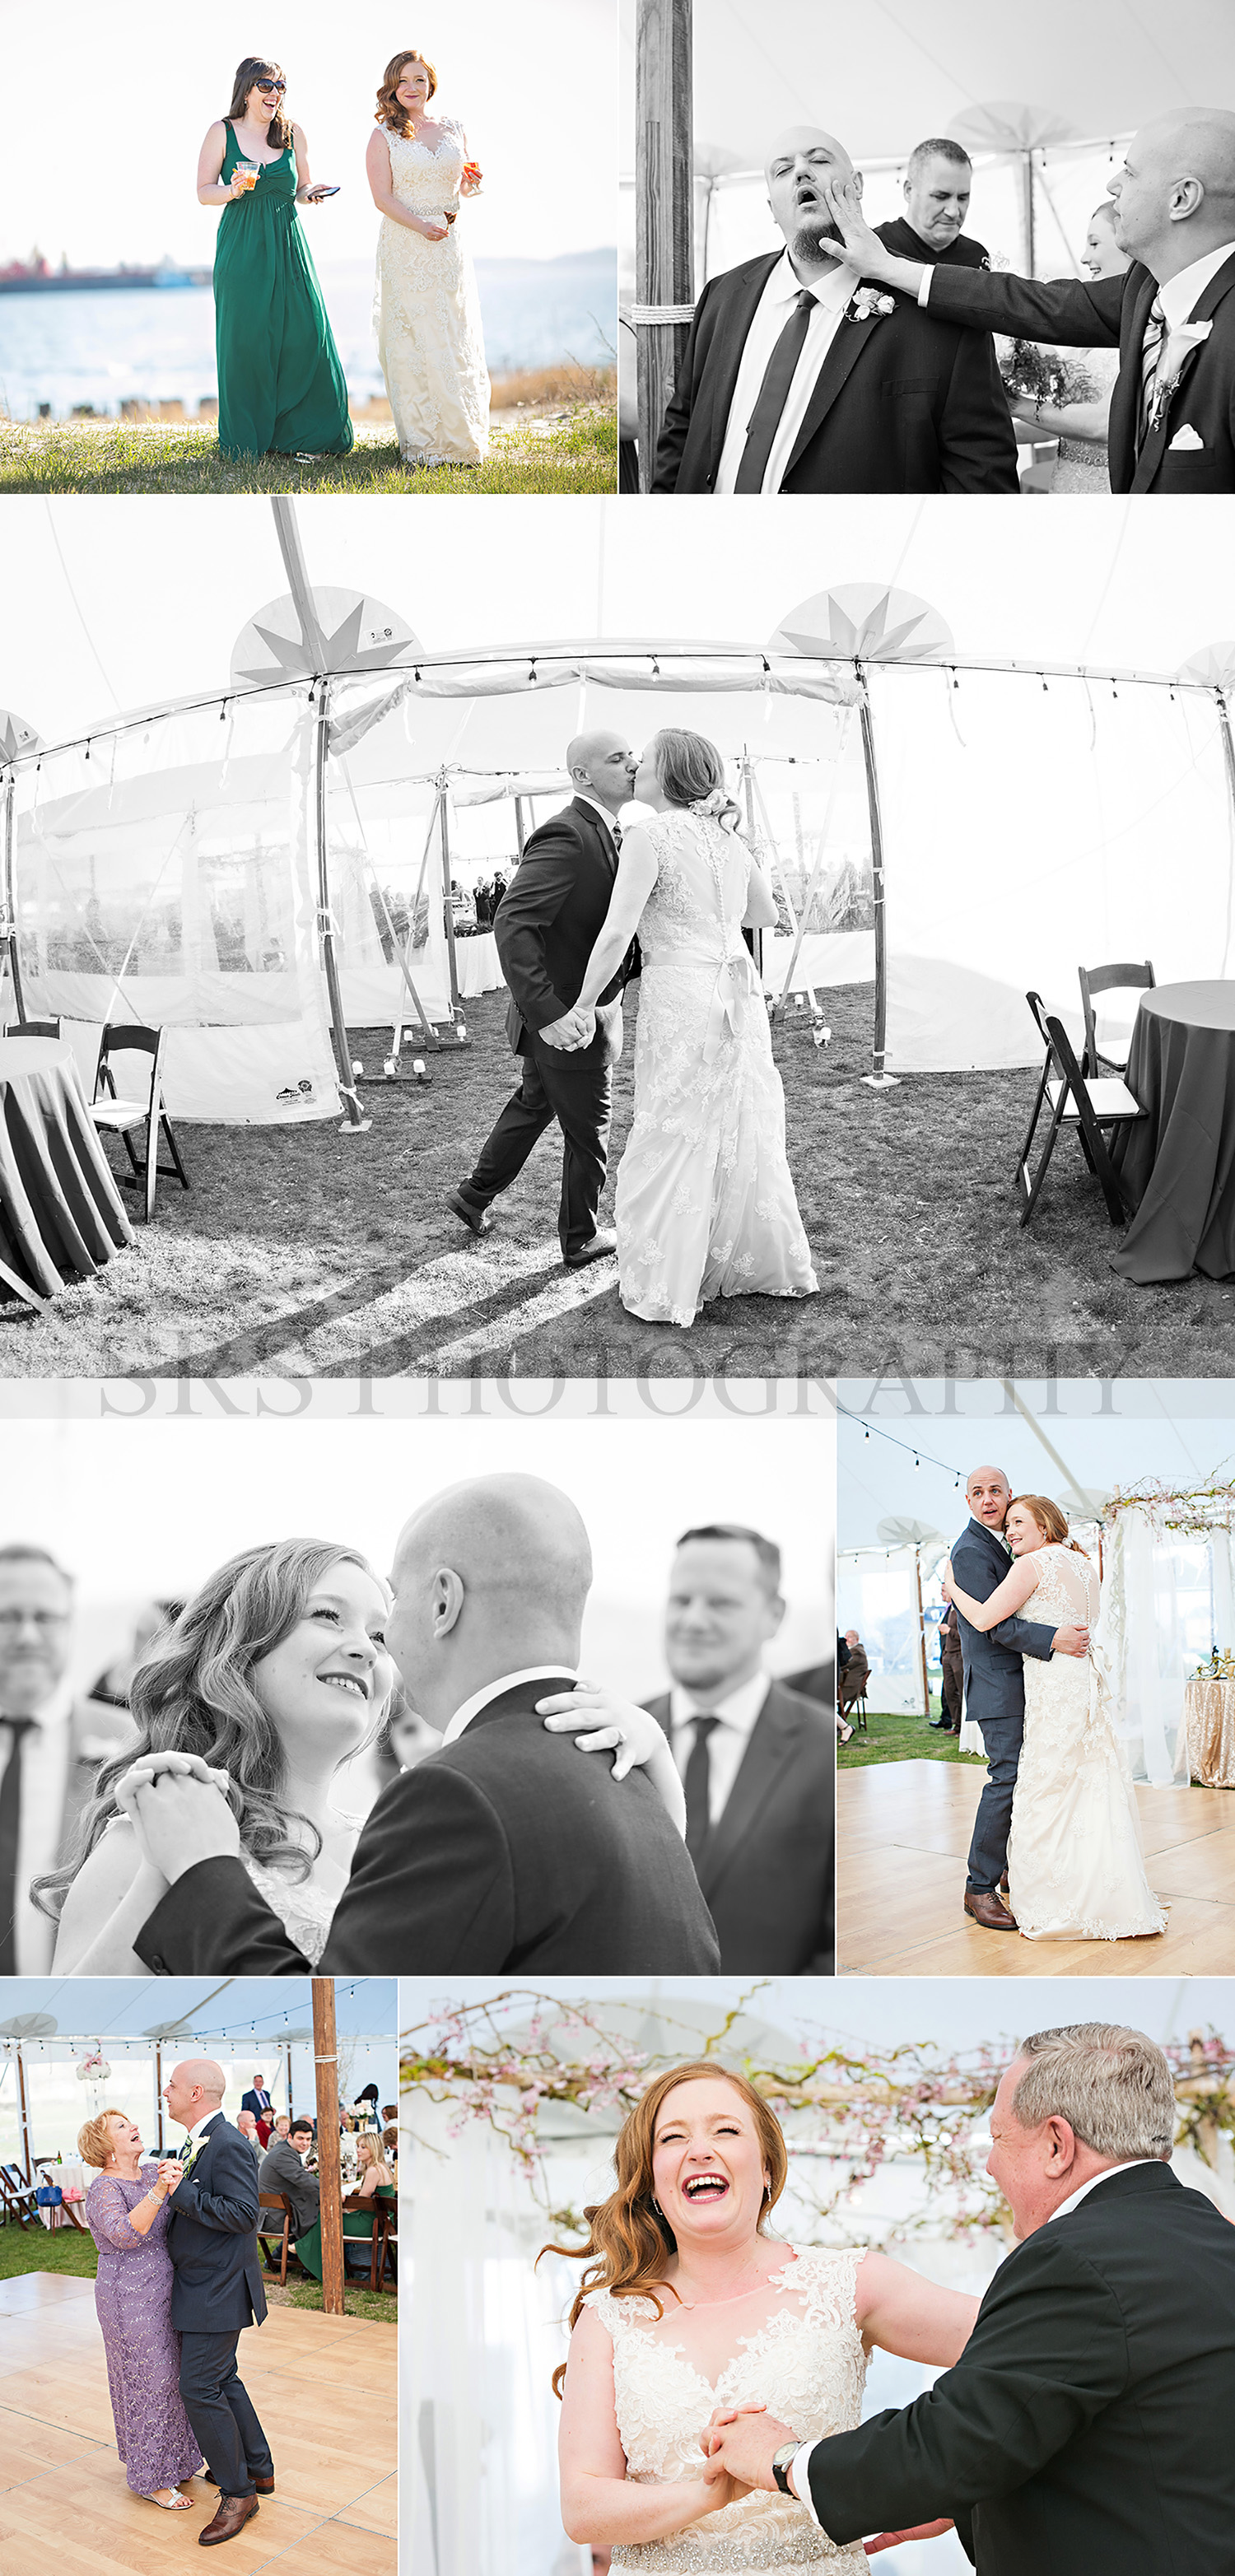 10_SRS_Photography_Sara_Stadtmiller_Asbury_Park_Wedding_Photography_NJ_Wedding_Photographer_Monmouth_County_Wedding_Photographer_Home_Wedding_Sandy_Hook_Weddin_Chapel